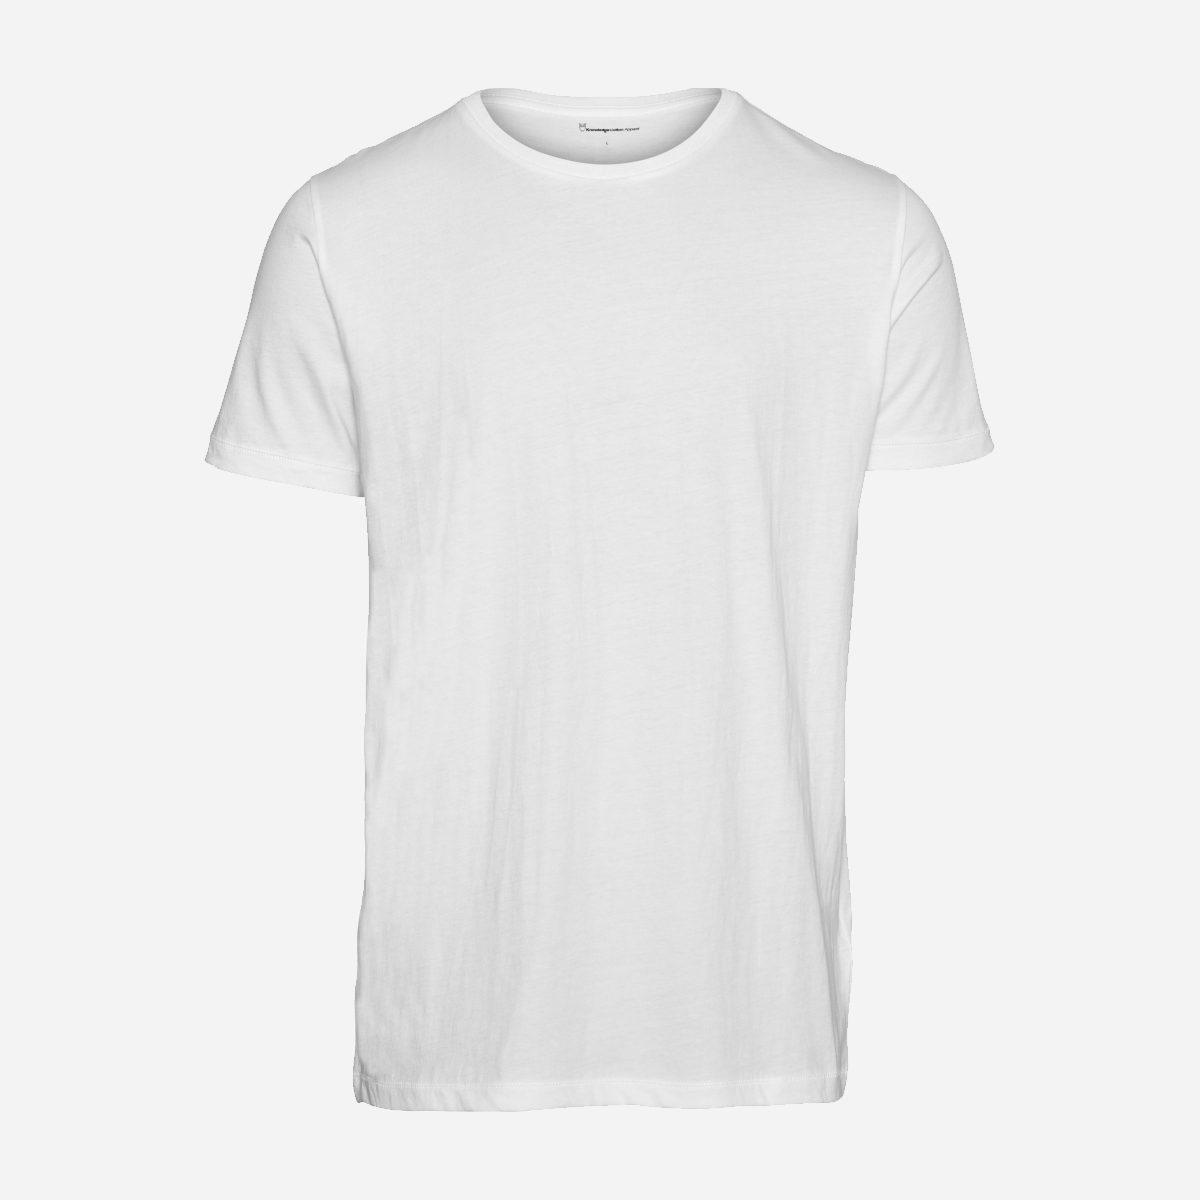 Ekologisk T-shirt Herr från Knowledge Cotton Apparel - GOTS-certifierad